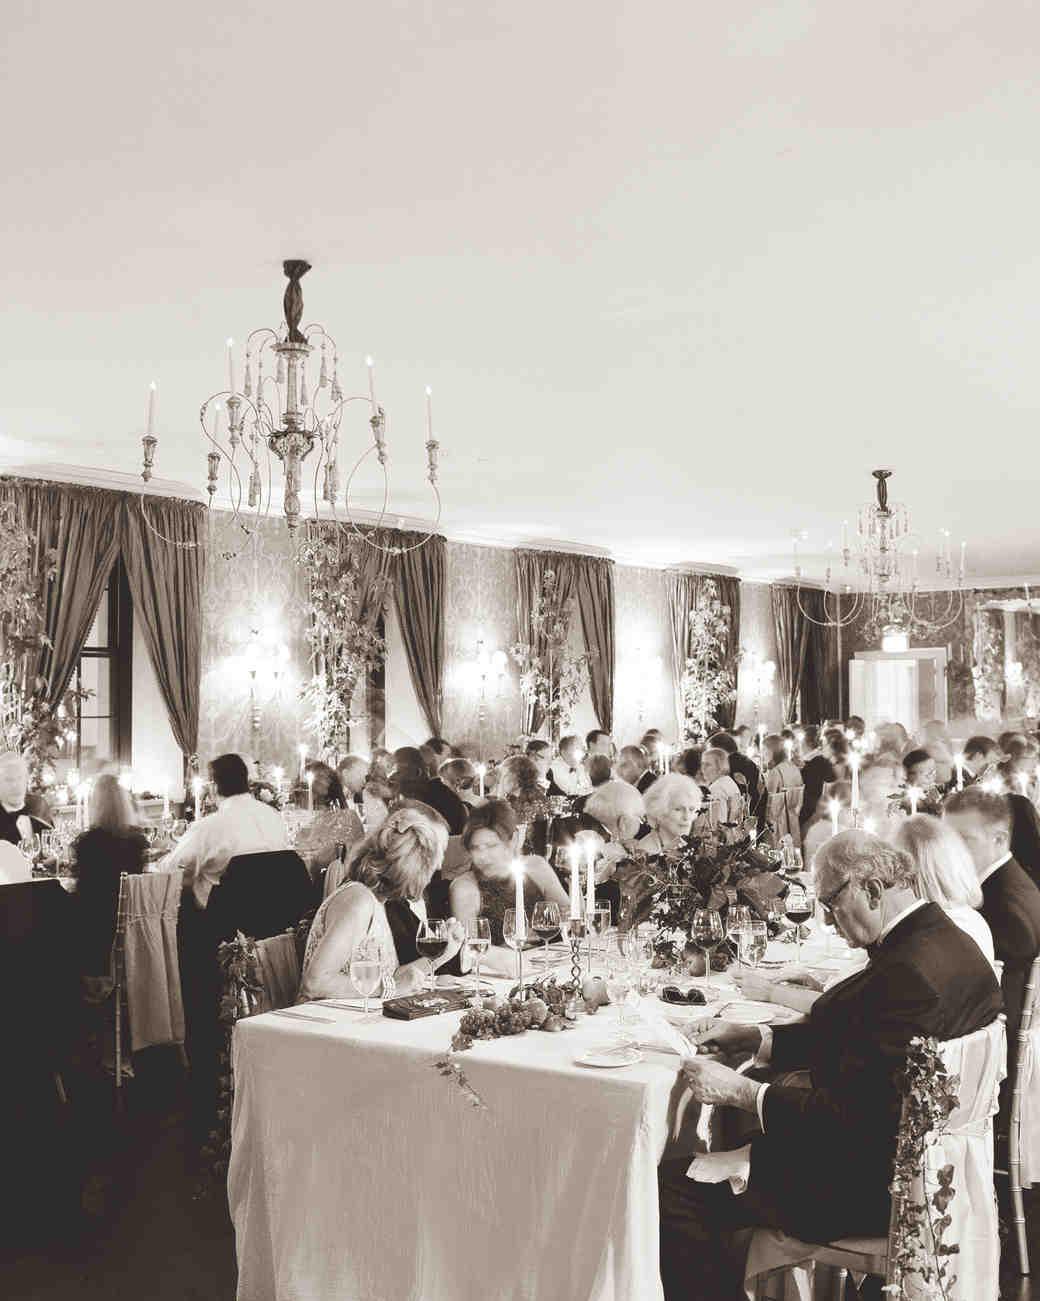 jo-andrew-wedding-ireland-2014-2-s112147-bw.jpg